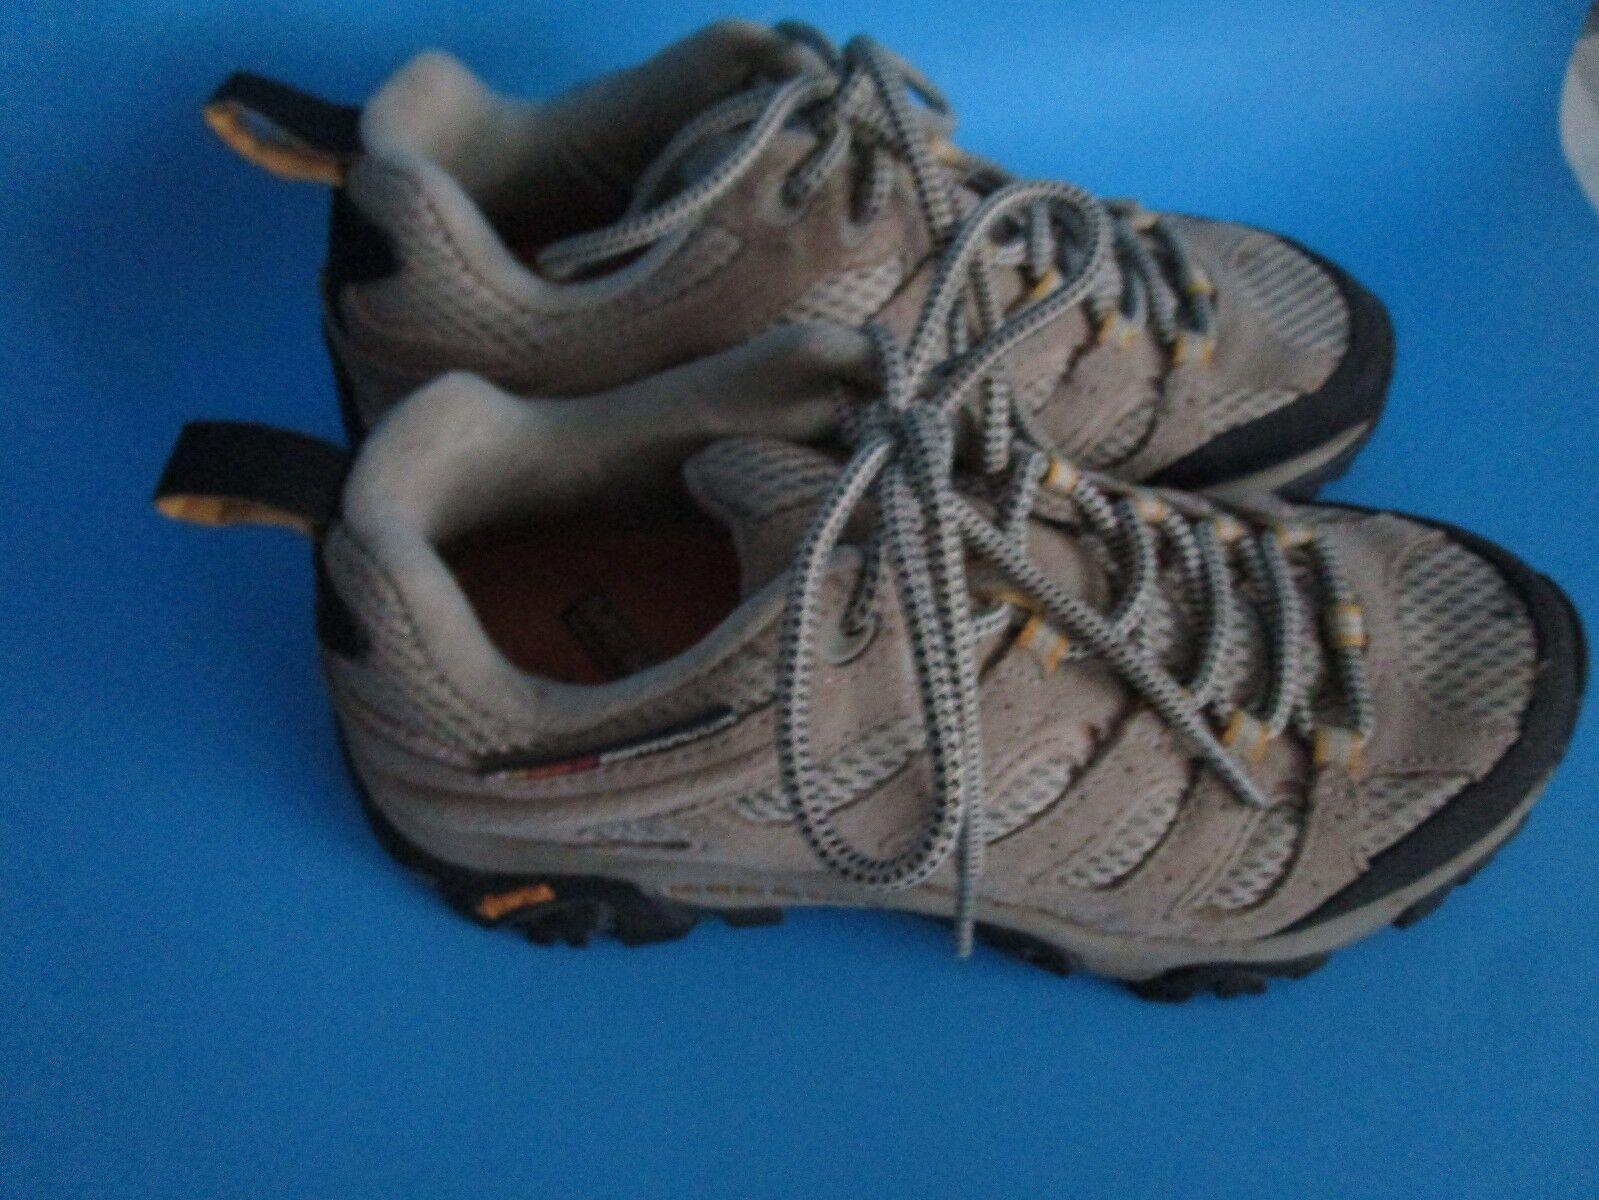 Merrell Moab 2 Ventilator Vibram Women's Trail Hiking shoes 6.5 US Suede Leather